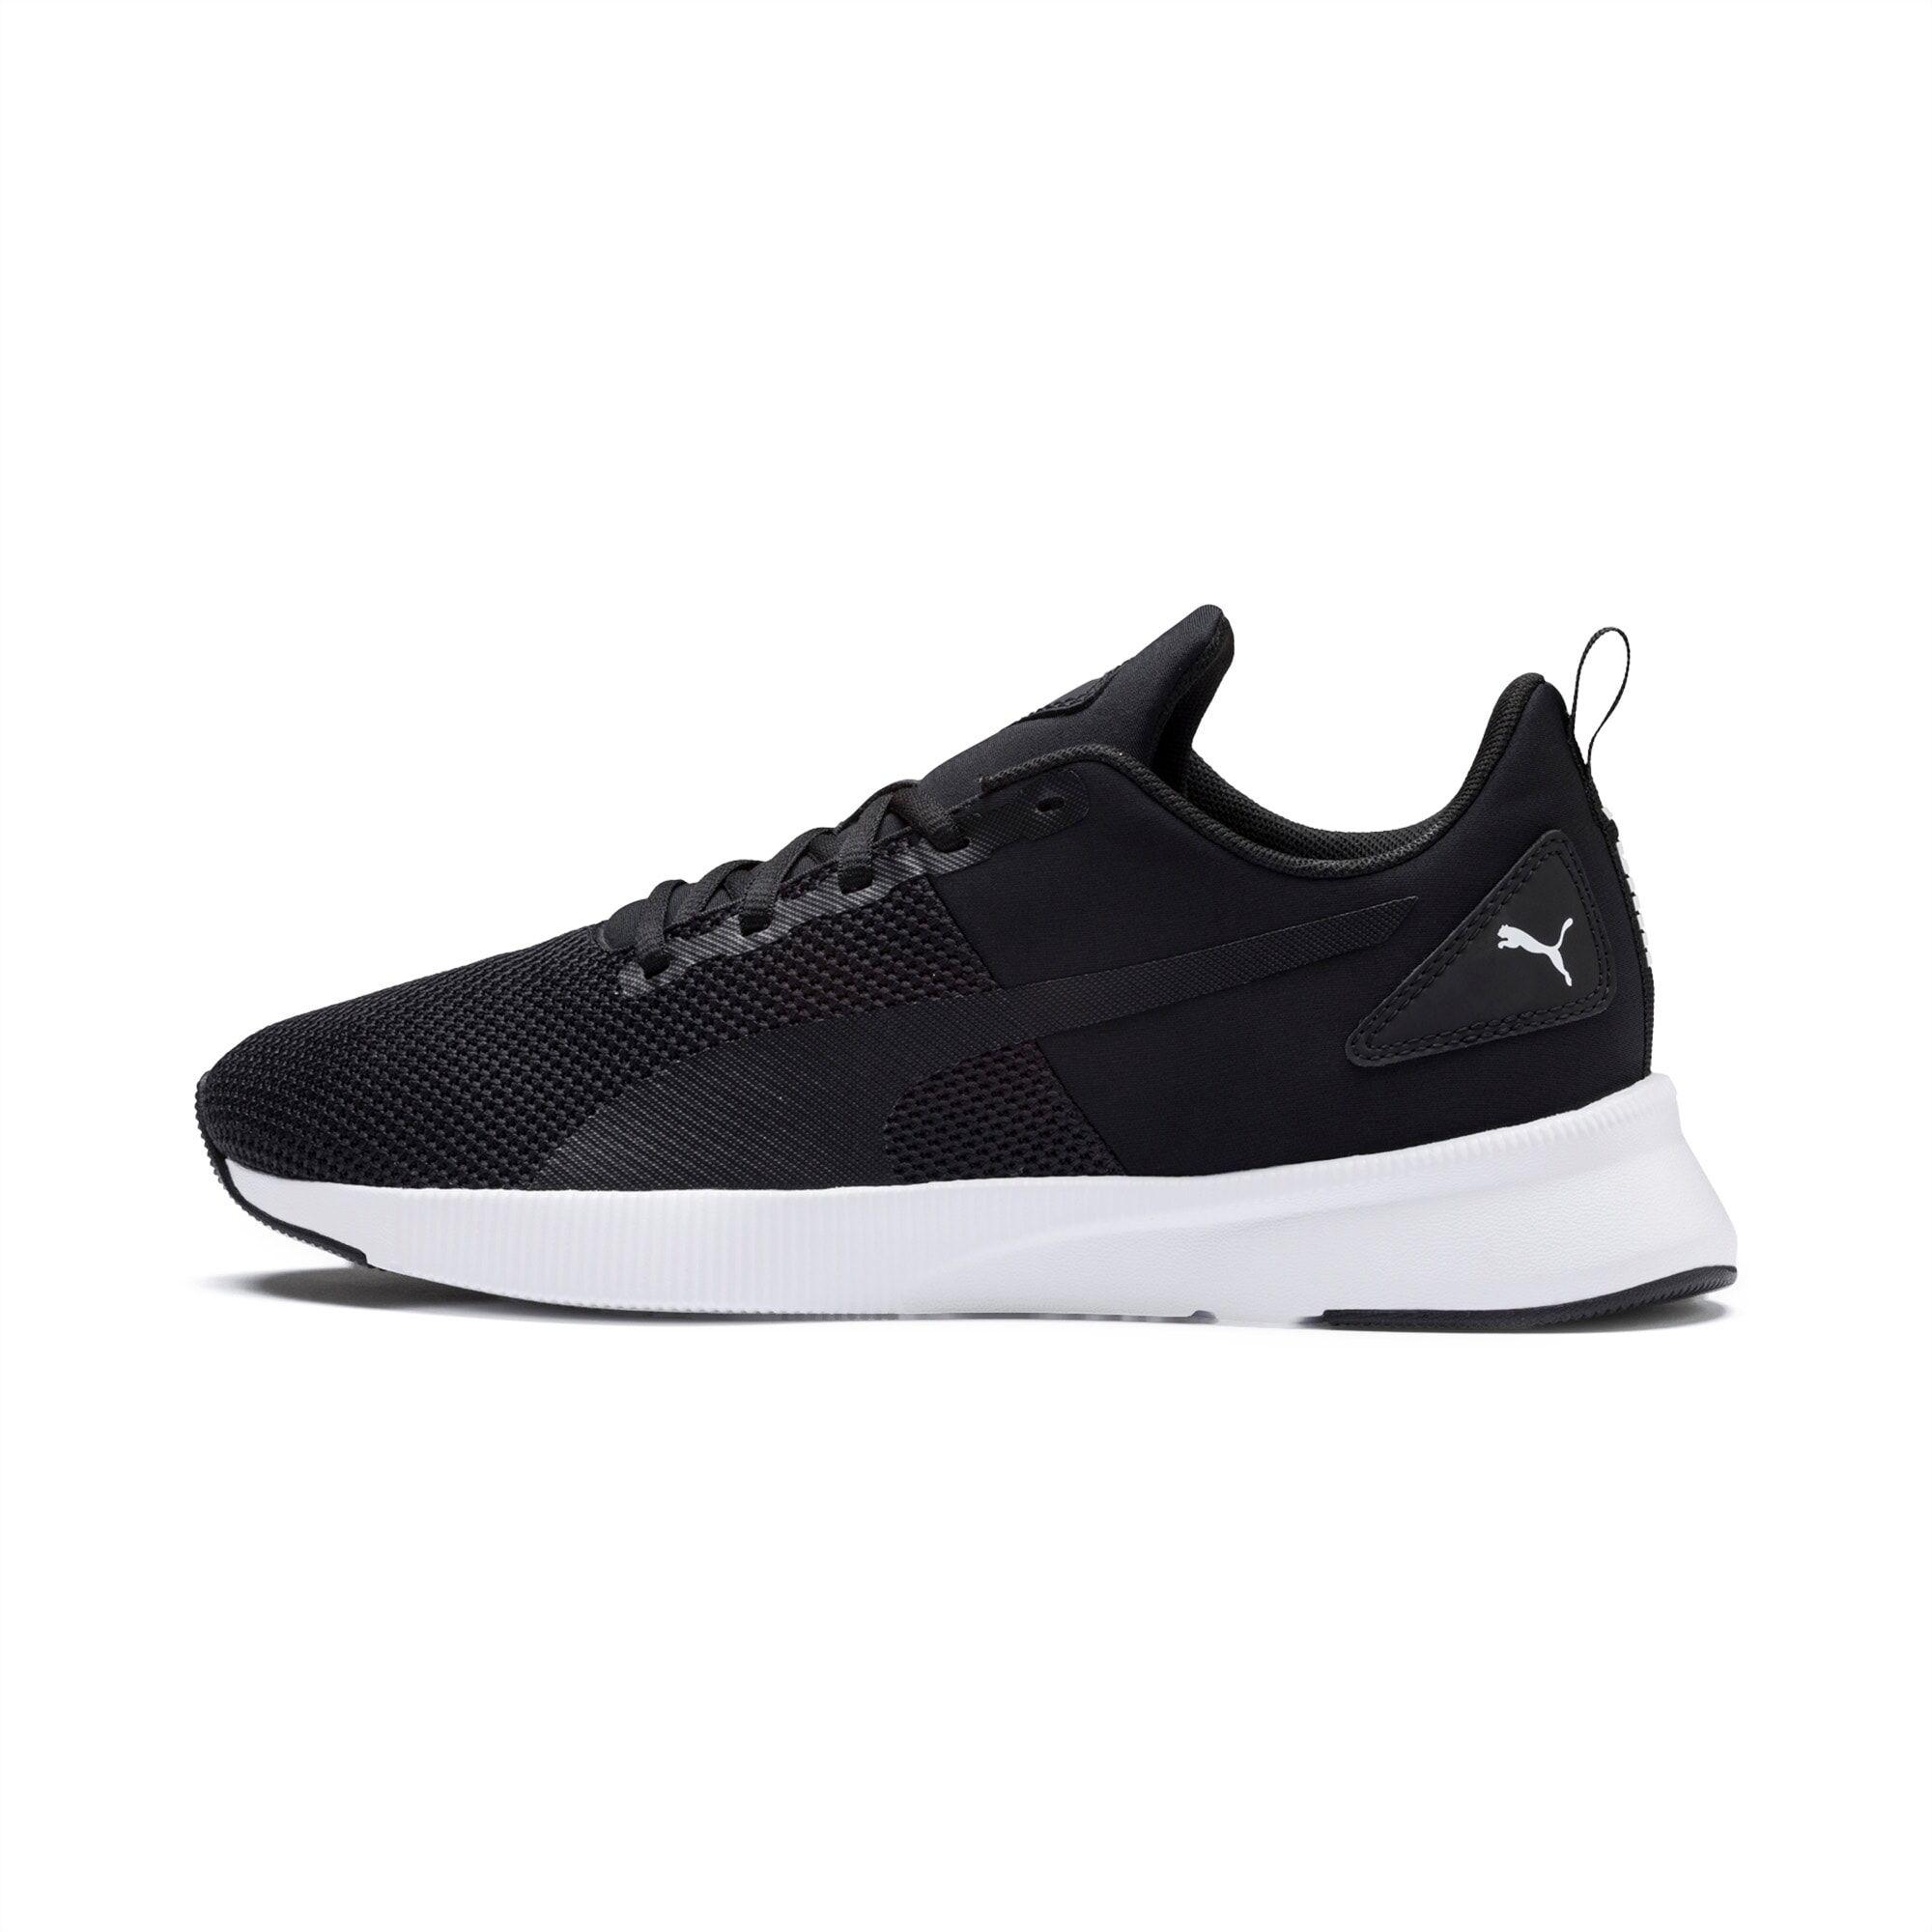 PUMA Chaussure de course Flyer Runner, Noir/Blanc, Taille 42, Chaussures